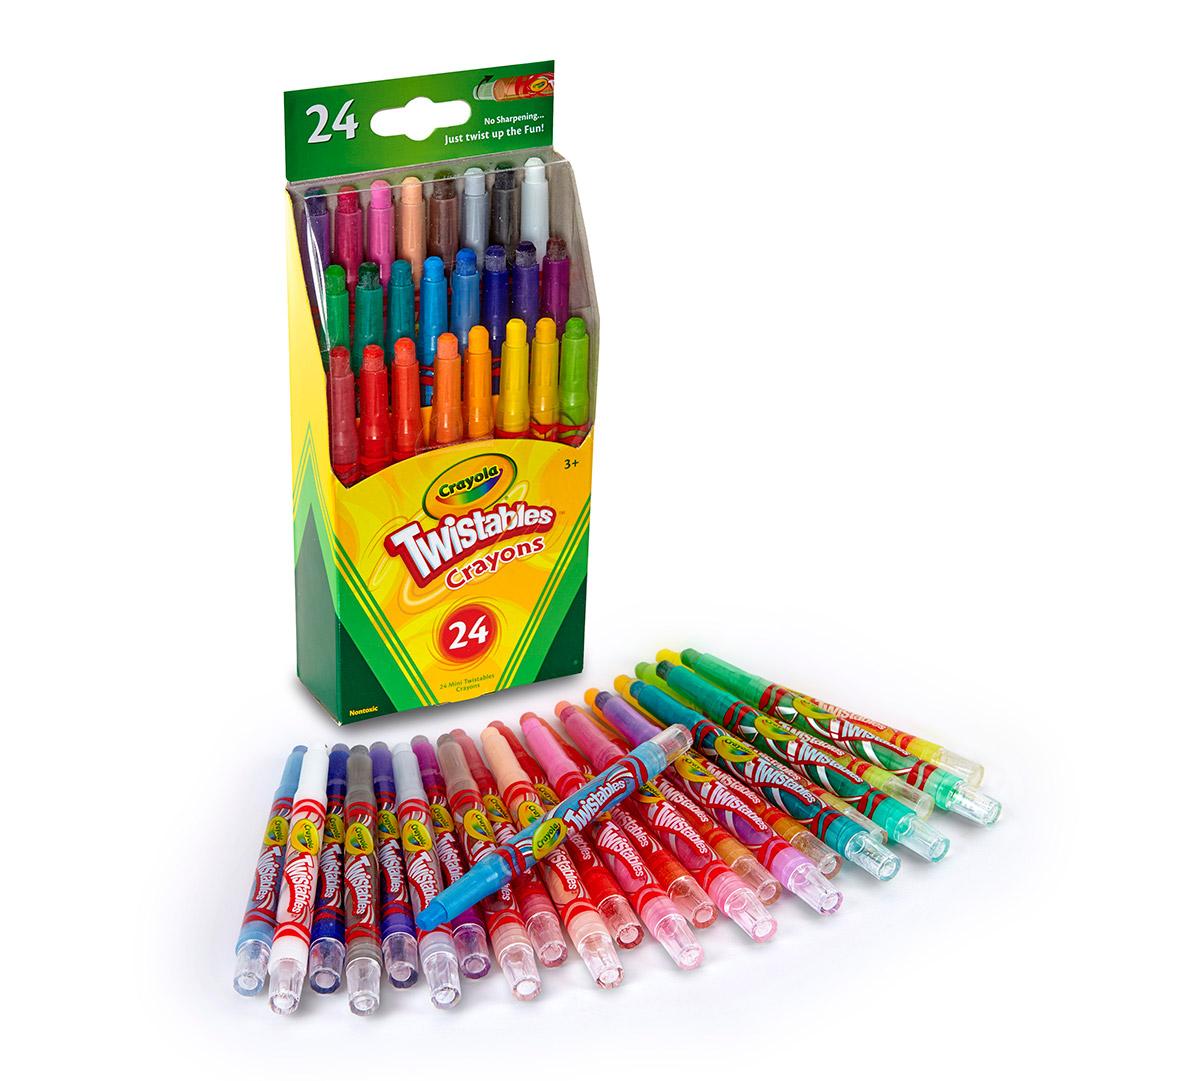 Crayola Mini Twistables Crayons Neon Colors Included